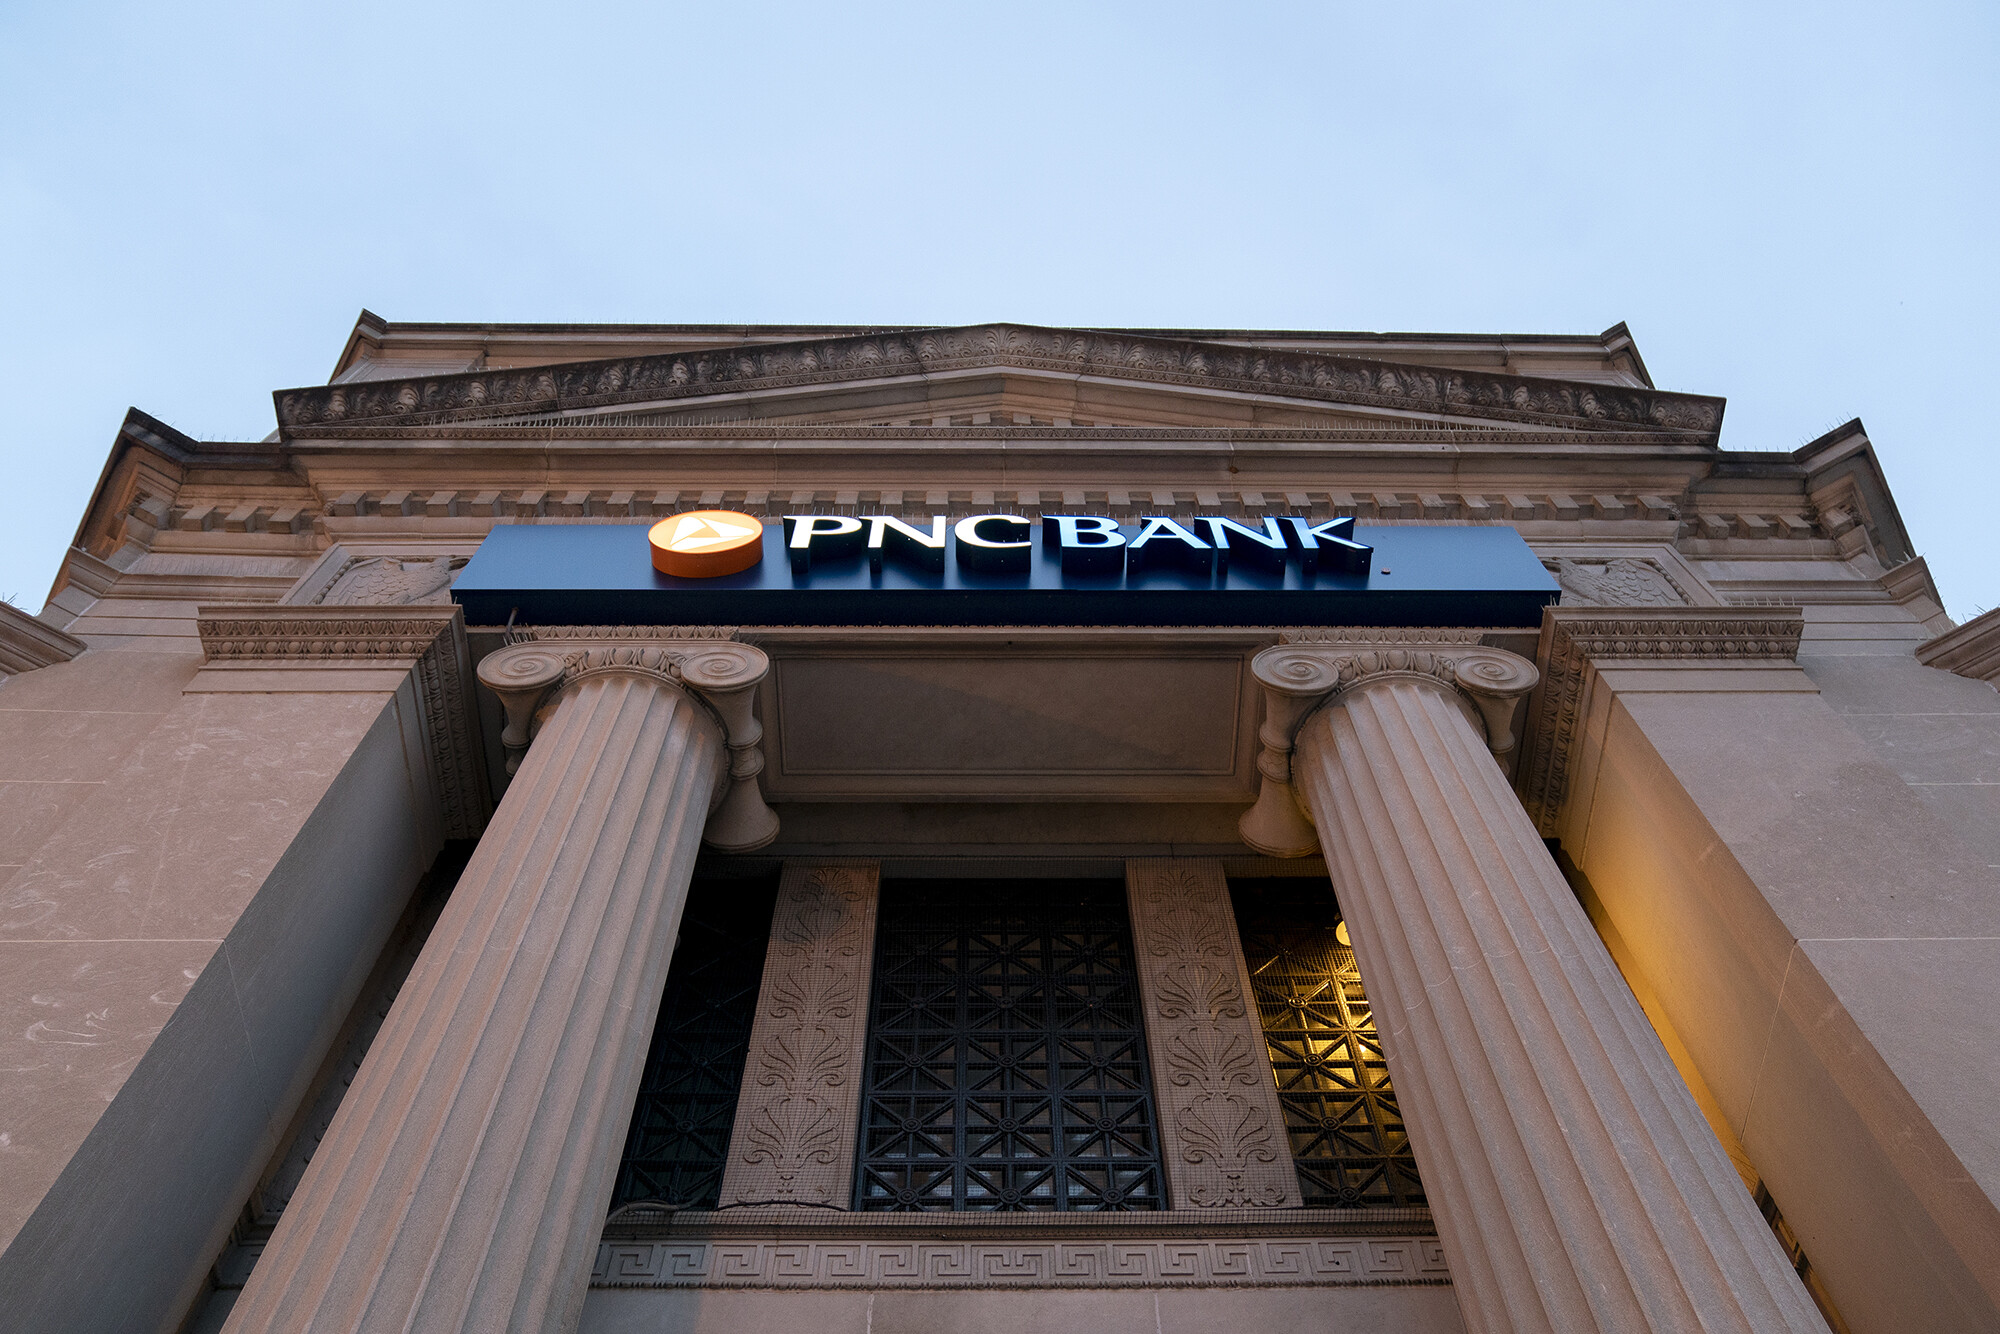 Big banks are getting even bigger, raising alarms in Washington